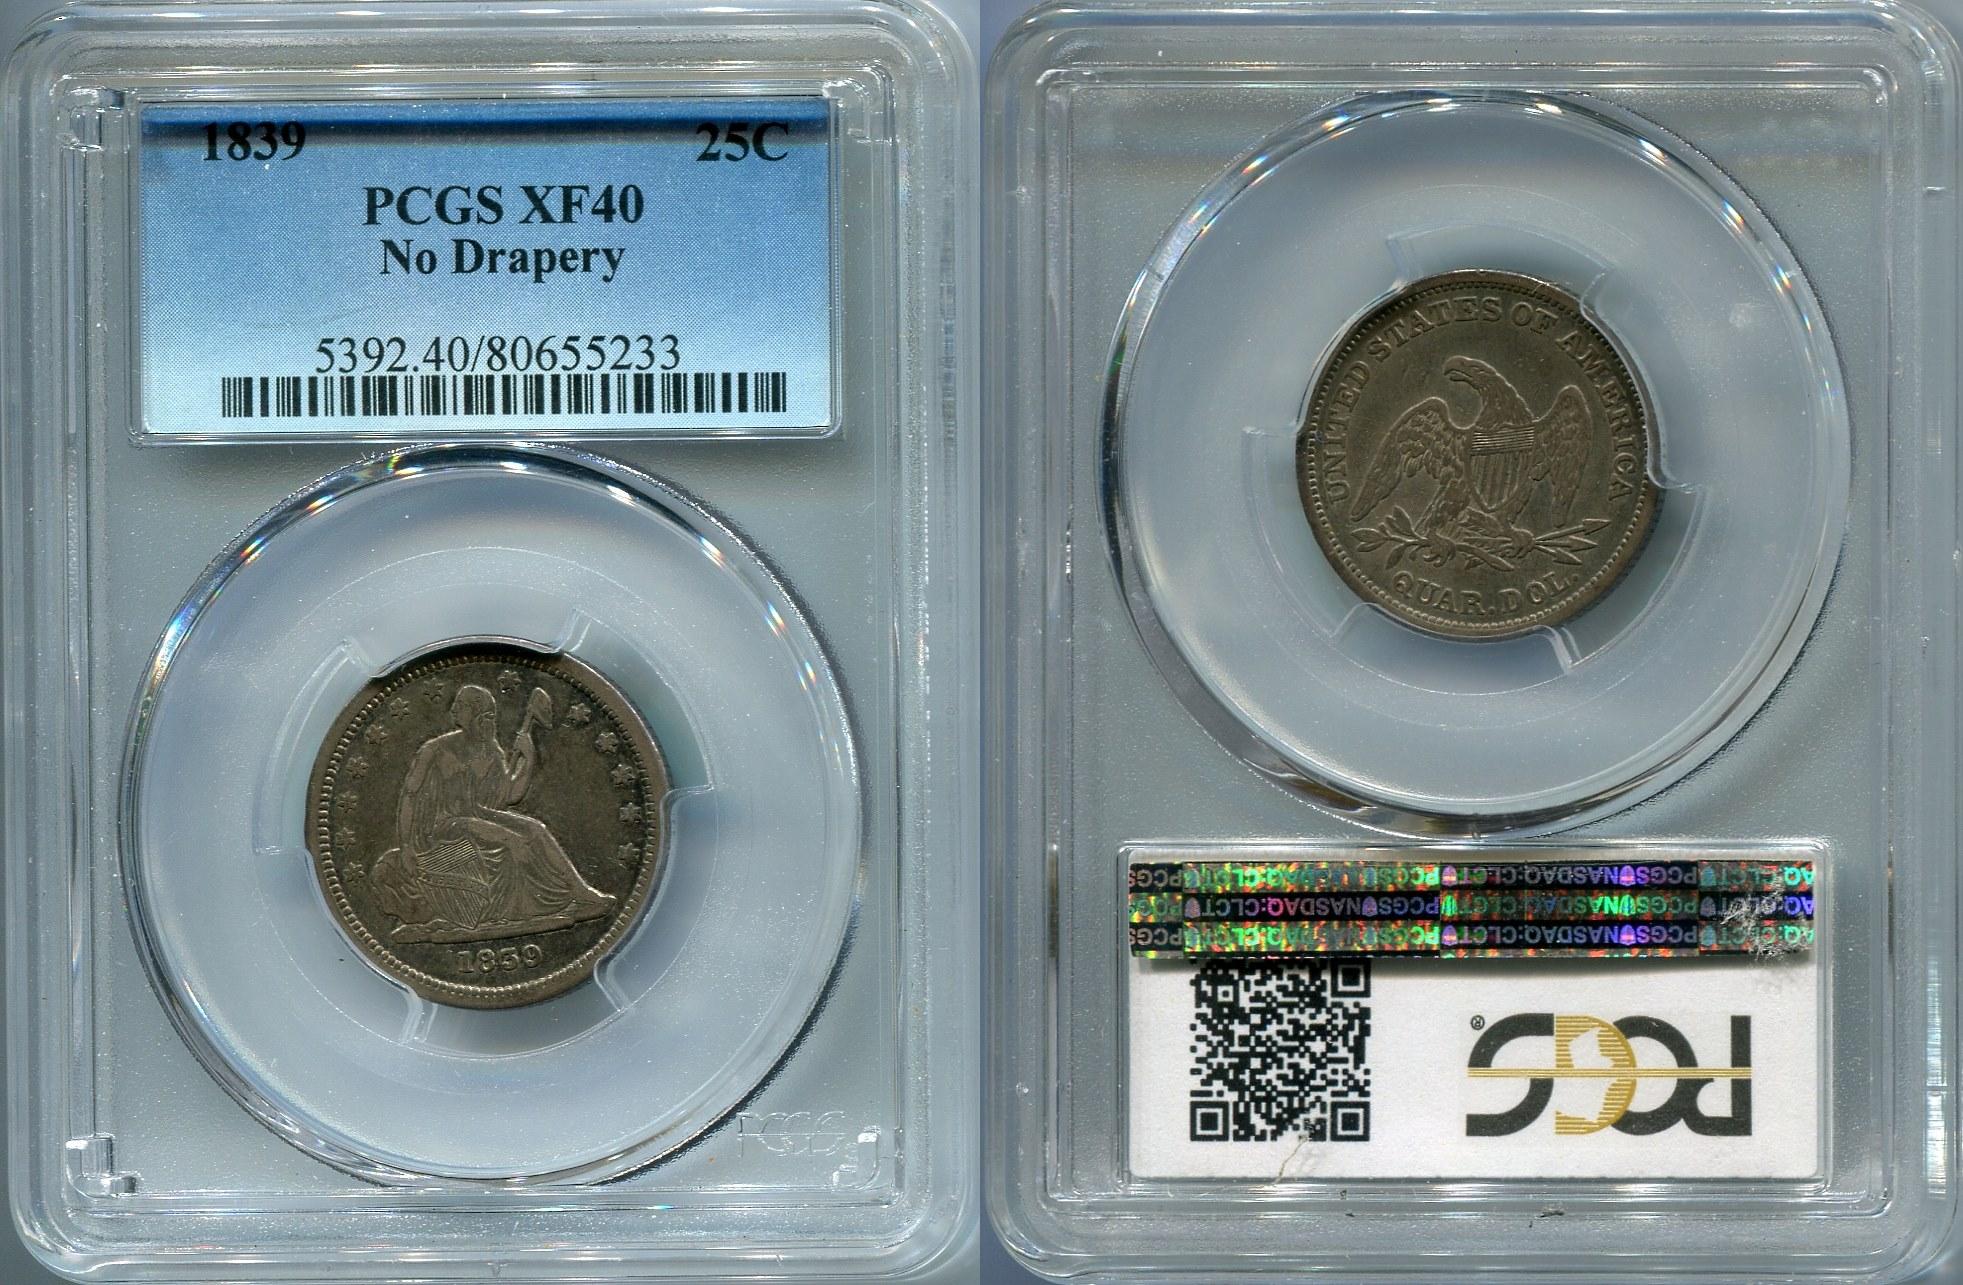 GFRC Open Set Registry - Jonjrl Coins 1839 Seated No Drapery 25C